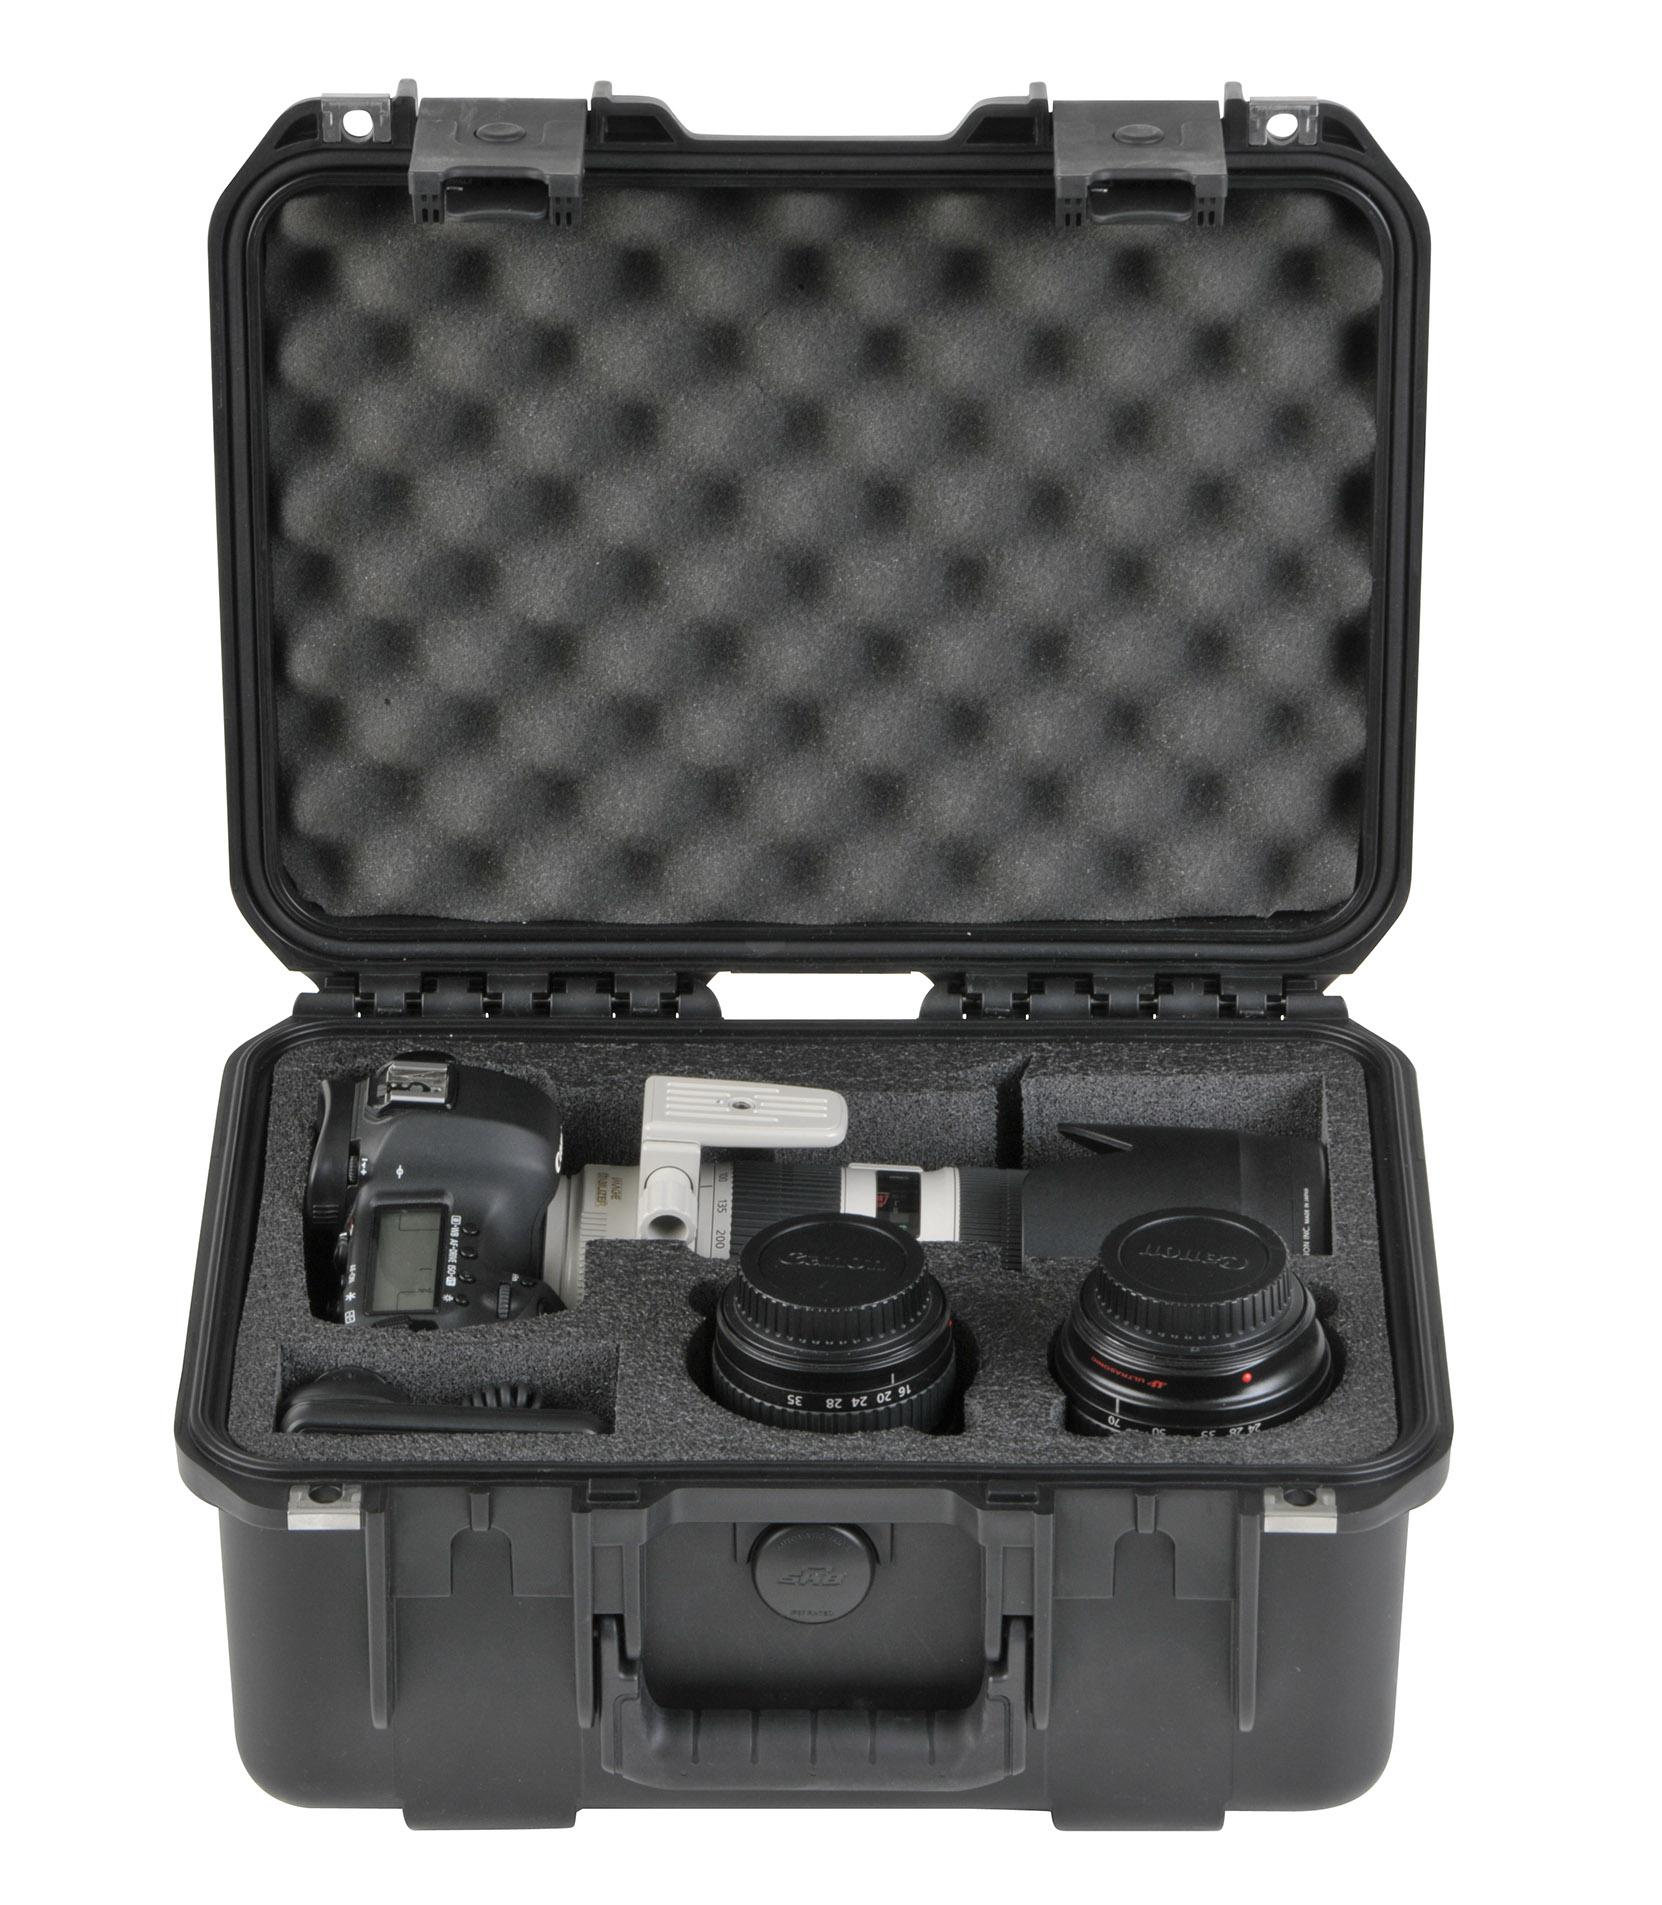 skb - 3I 13096SLR1 iSeries for 1 DSLR w attached lens - Melody House